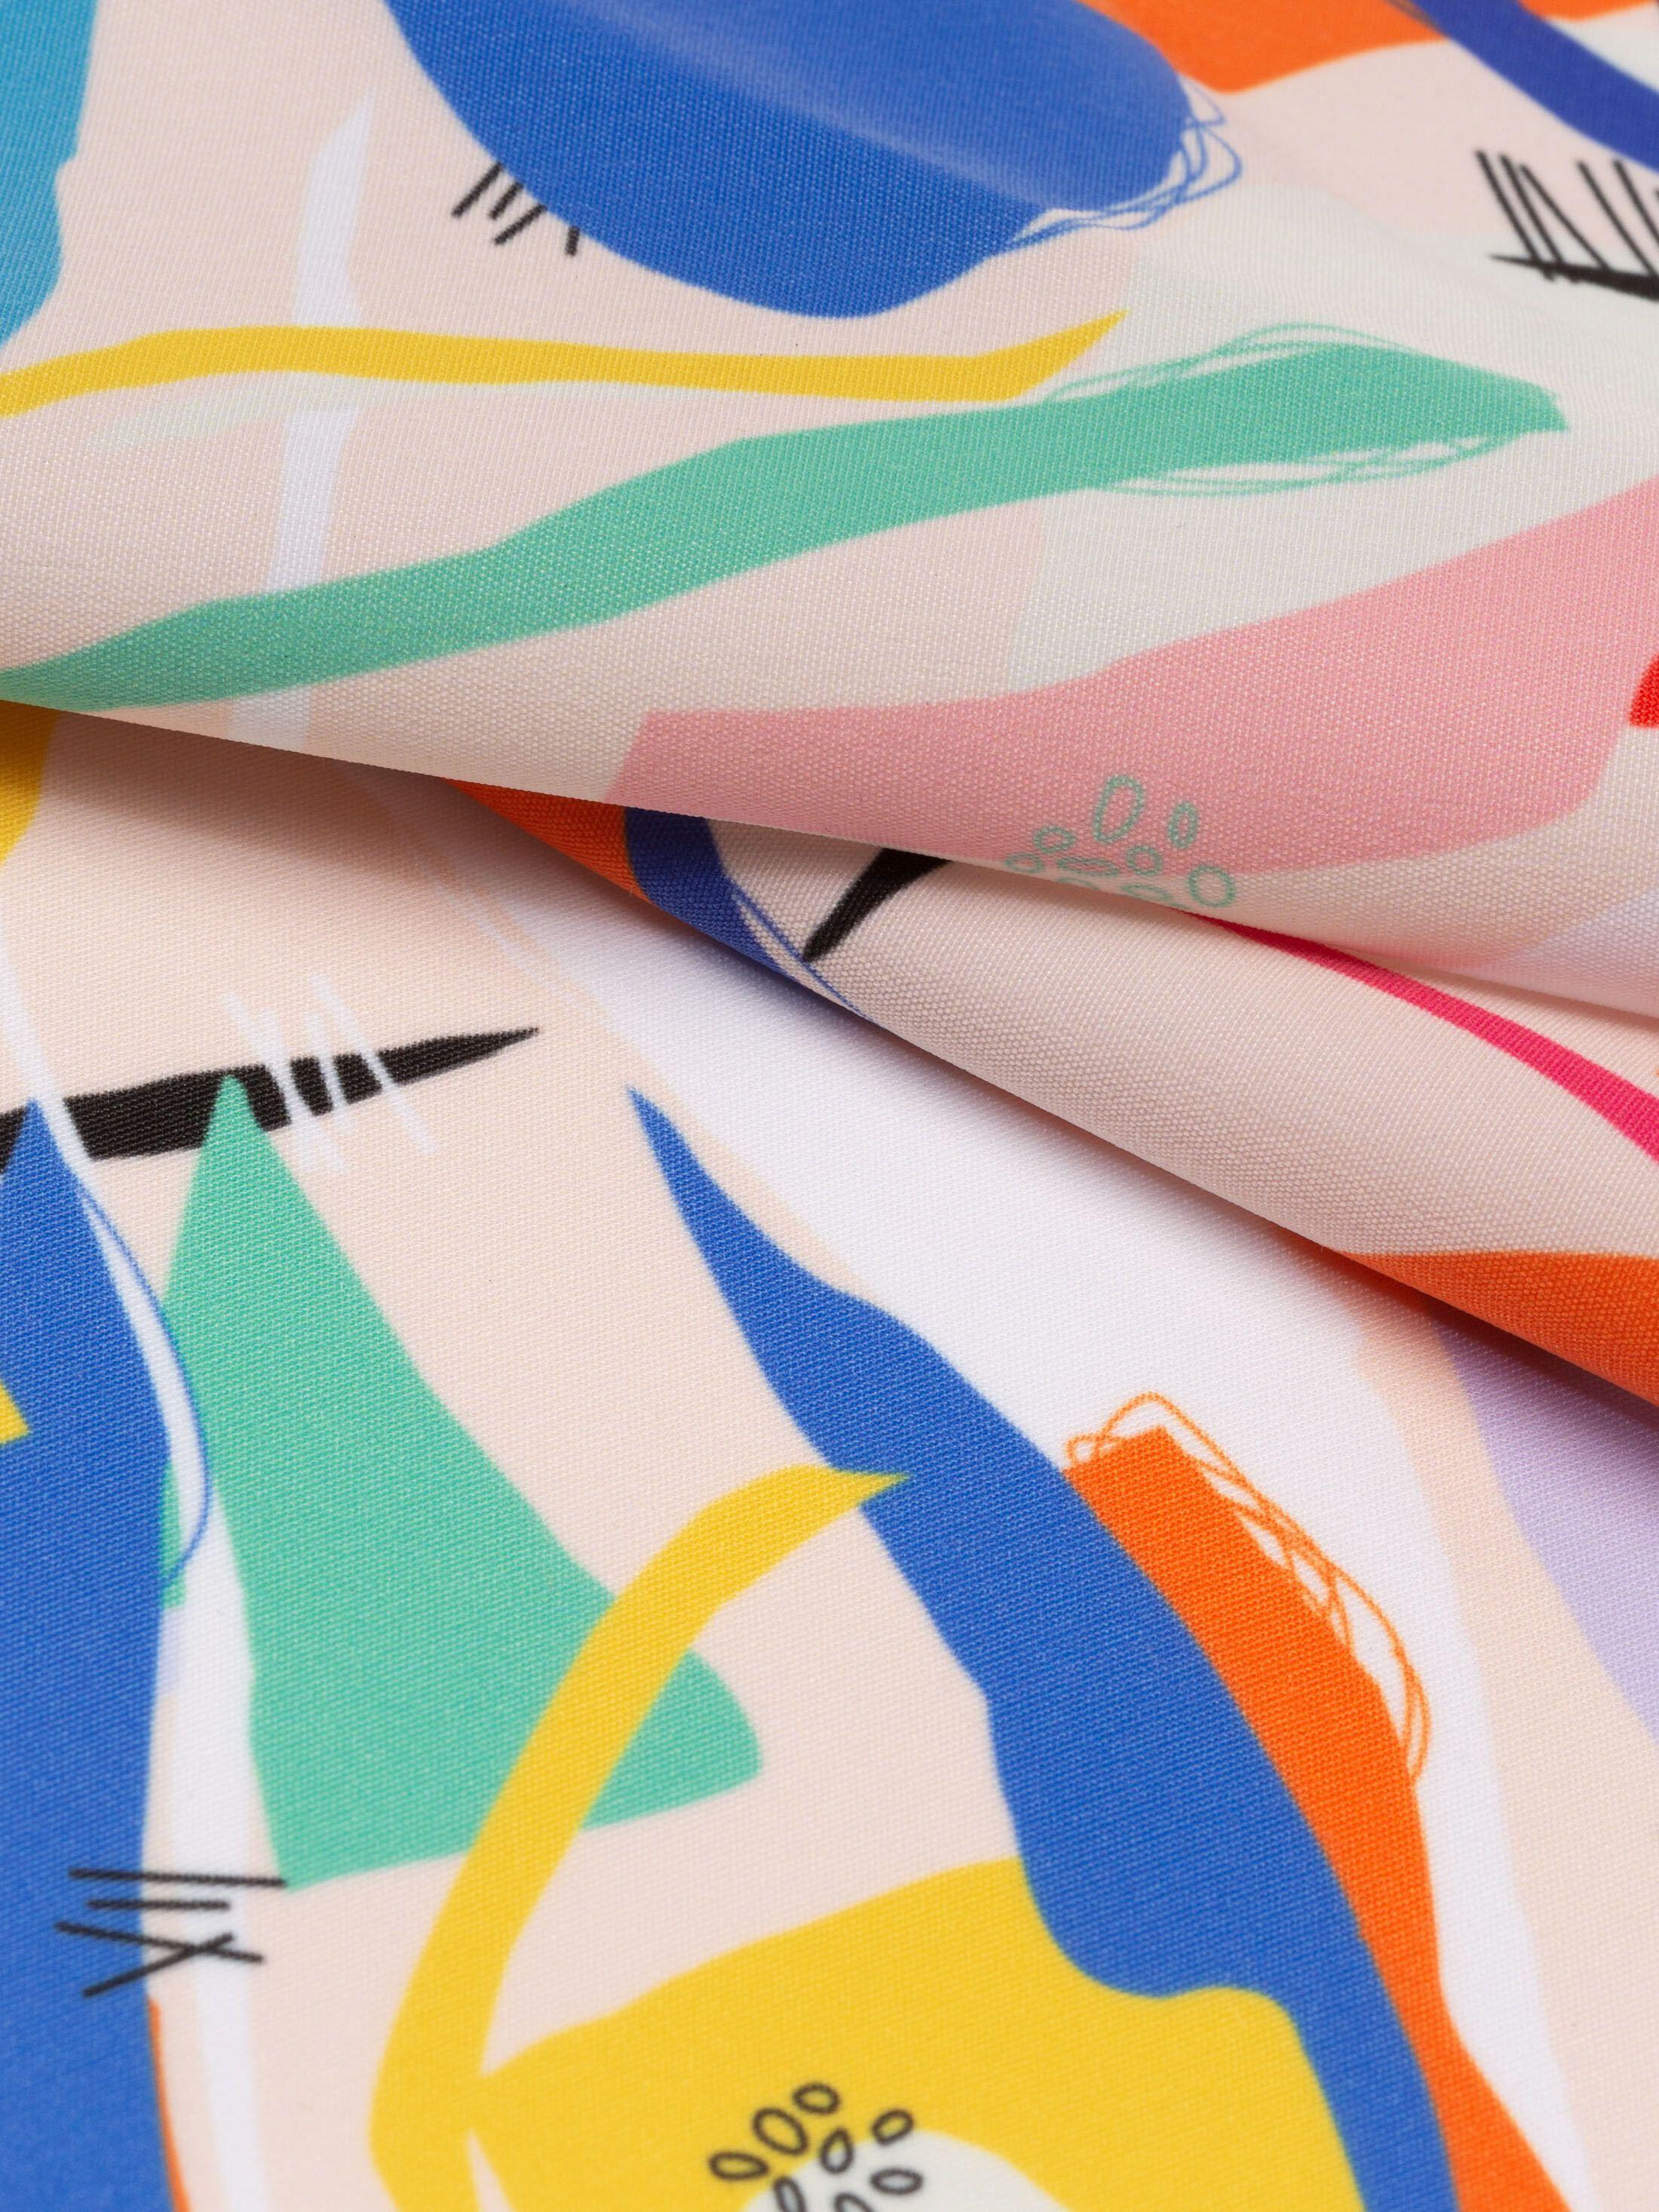 custom Poly fabric printing creased